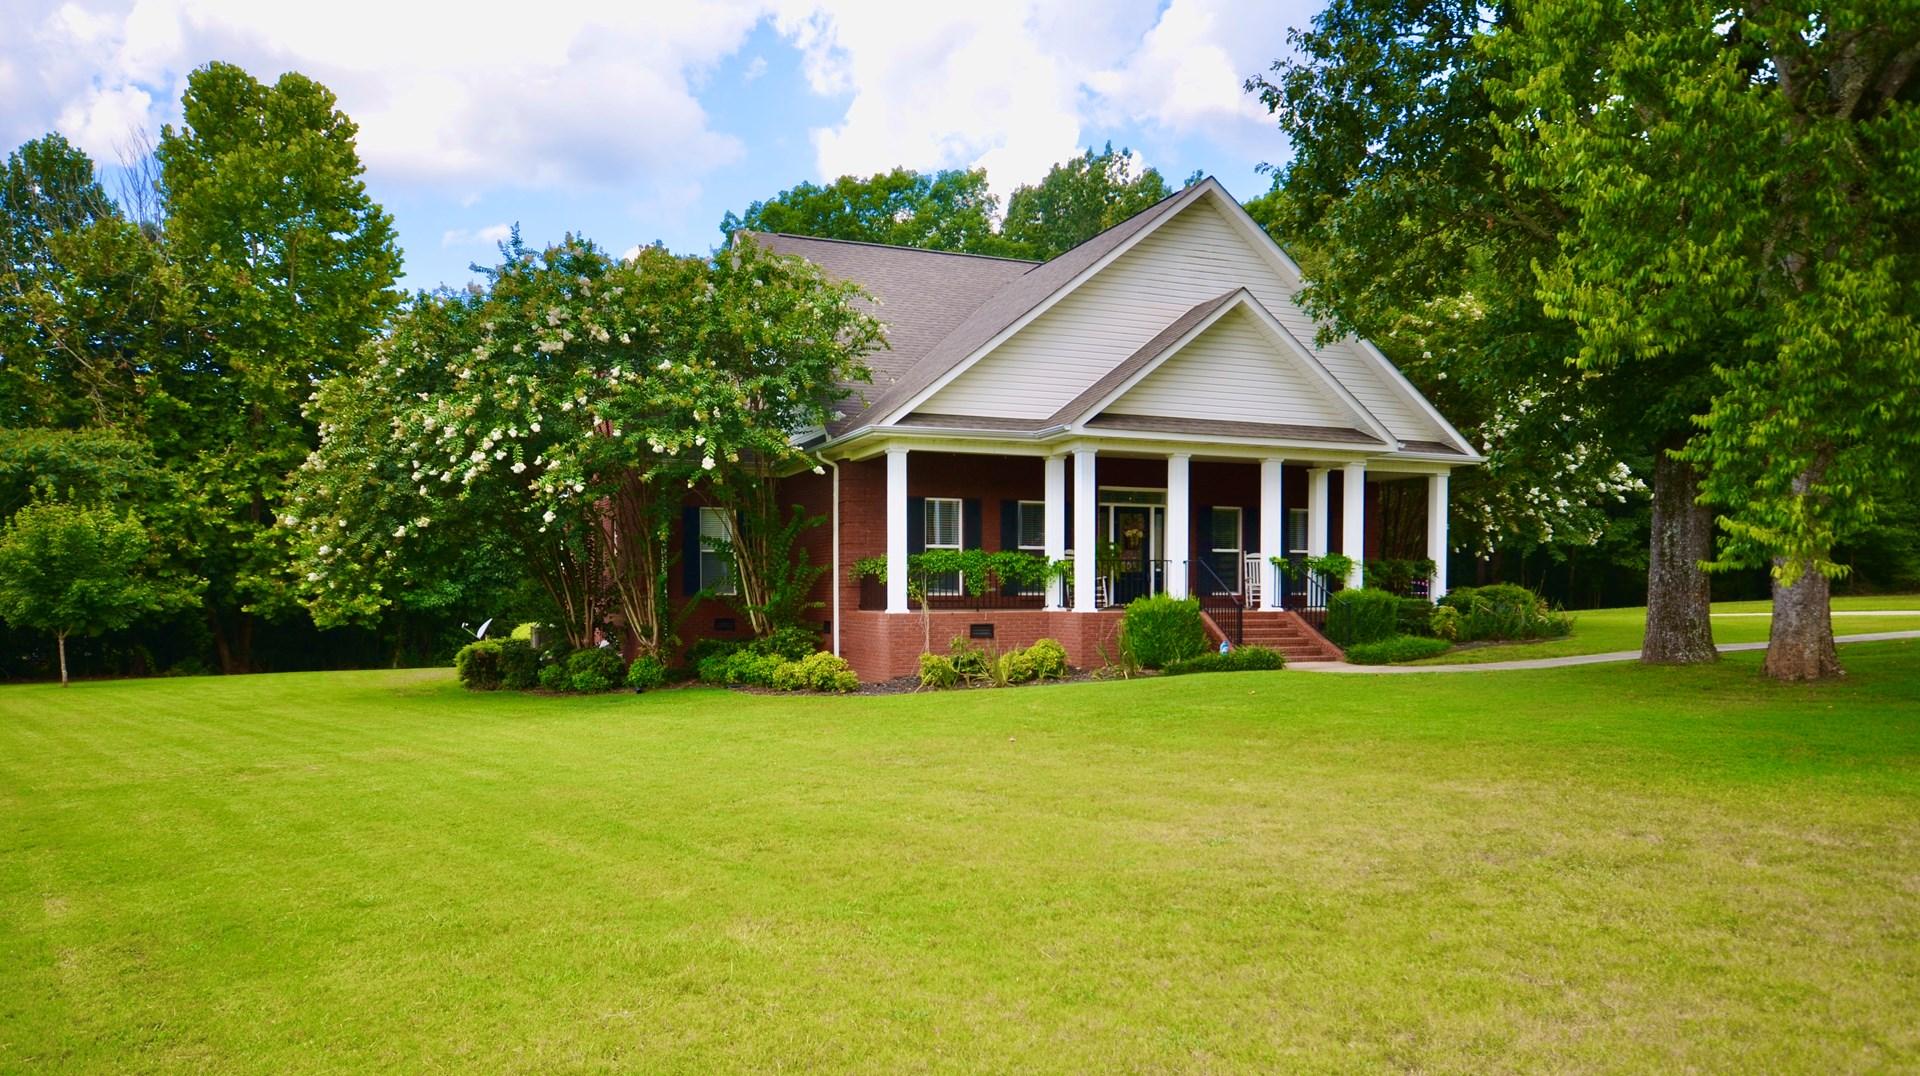 4 Bedroom on .90 acre lot Hartselle Alabama